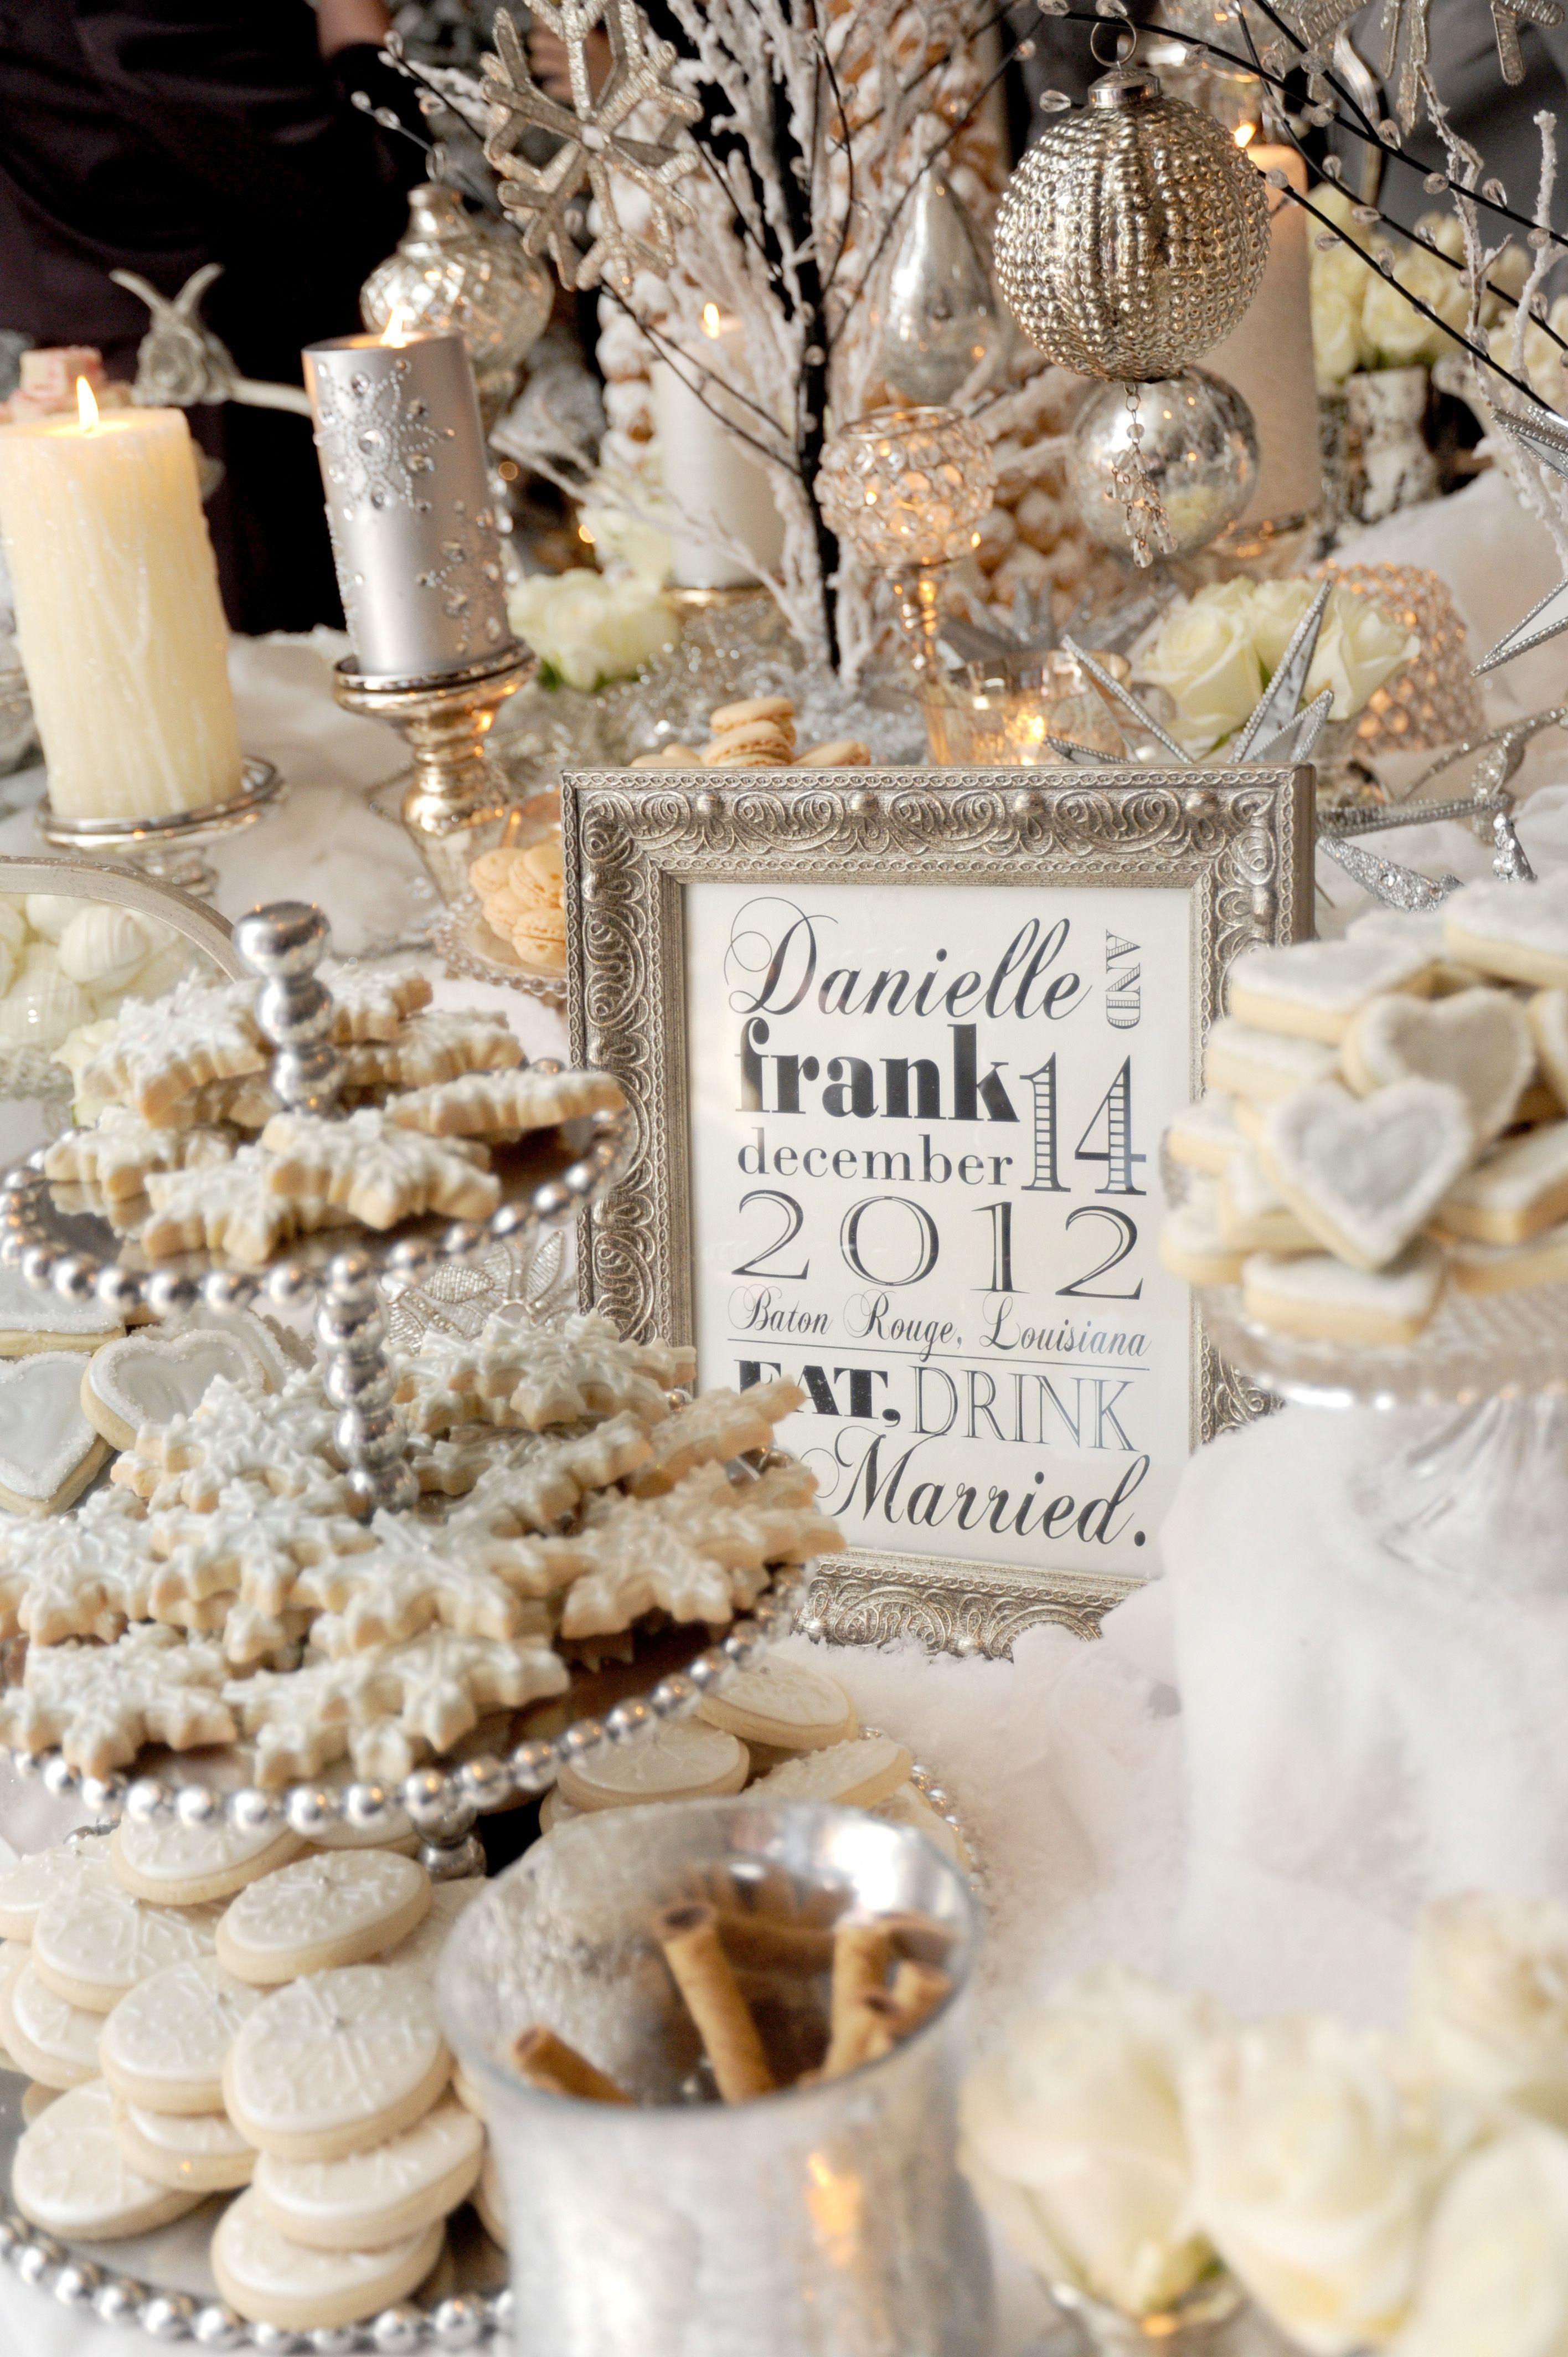 snacks table in winter style winter wedding idea